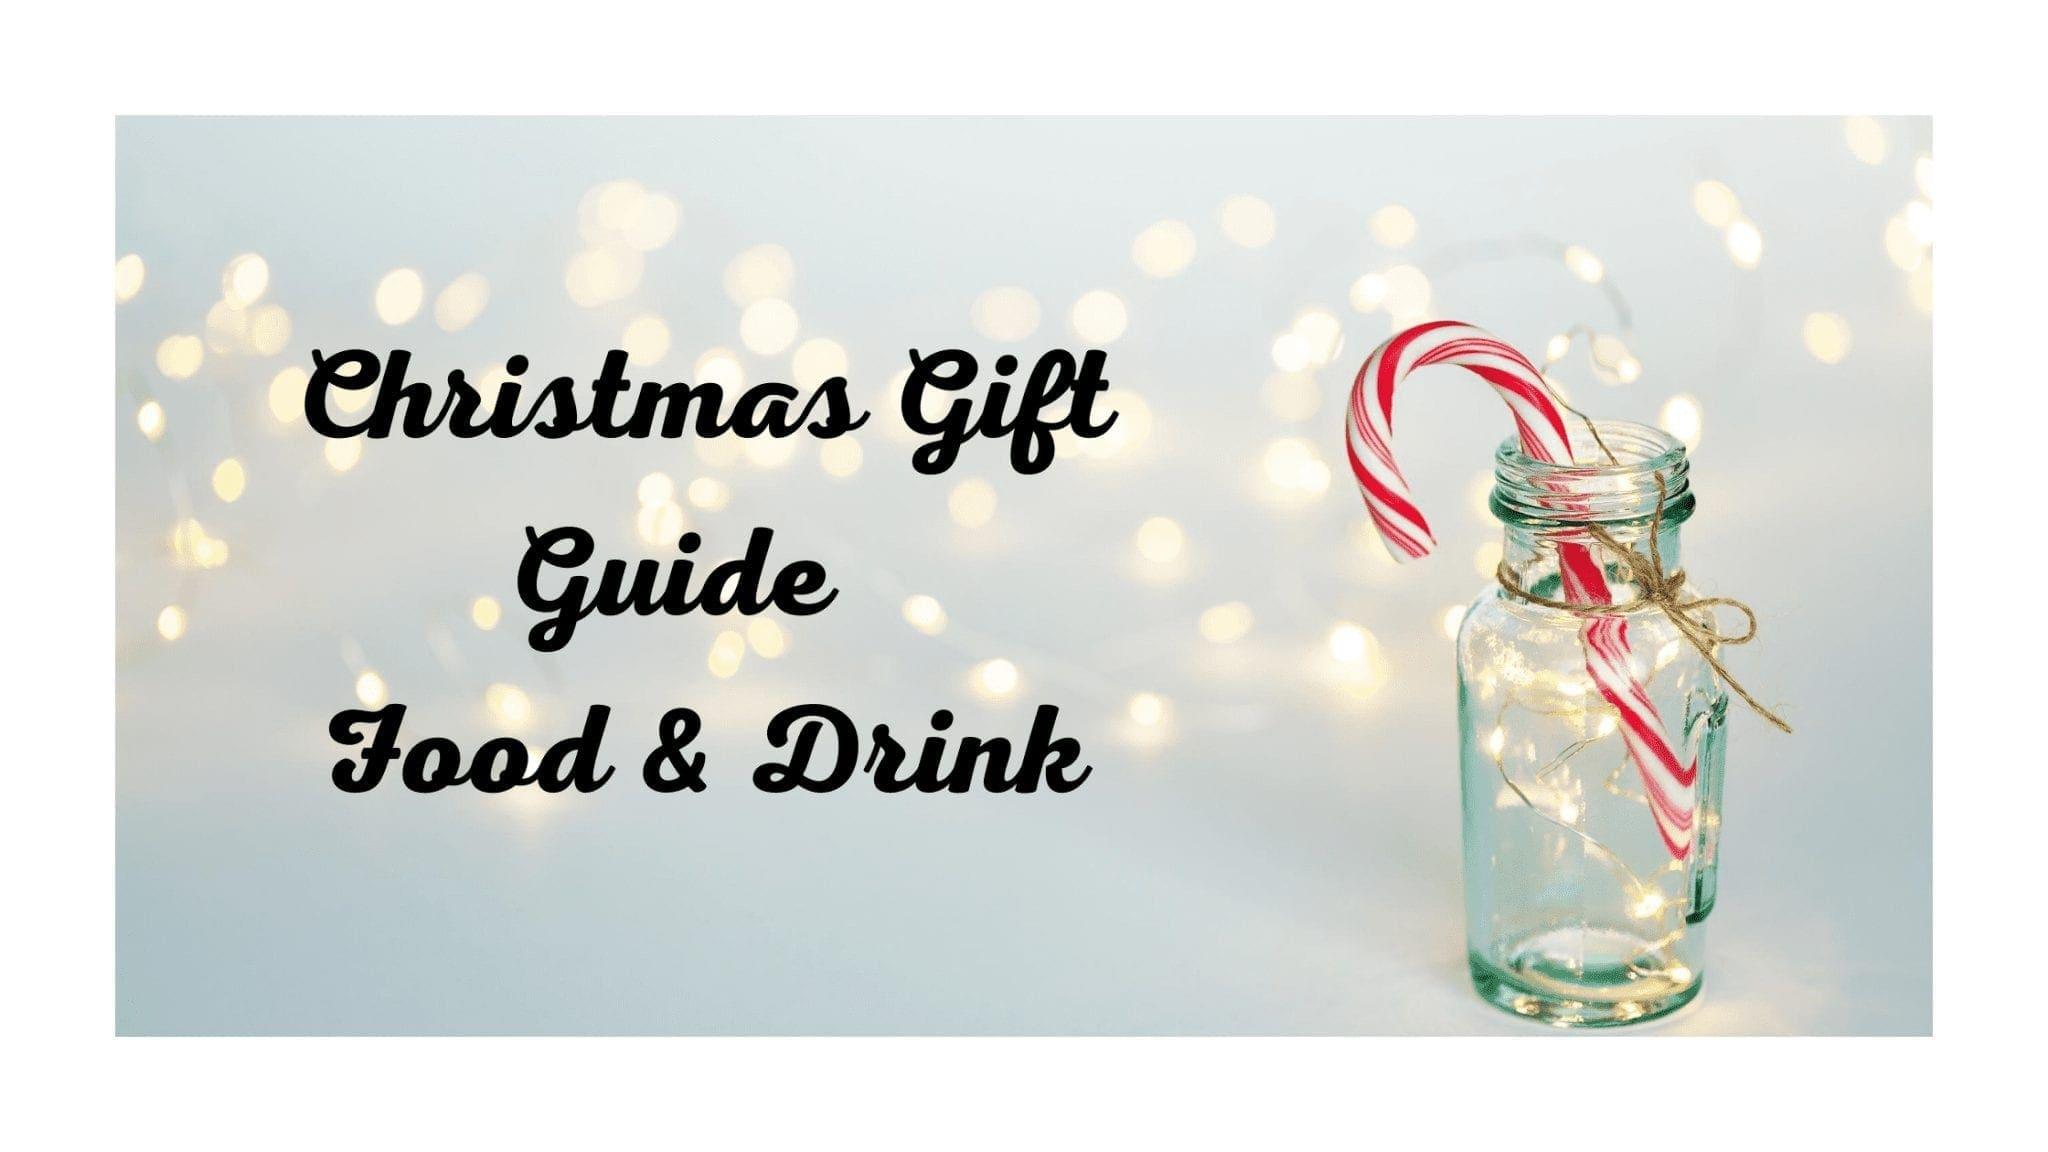 Christmas Gift Guide - Food & Drink